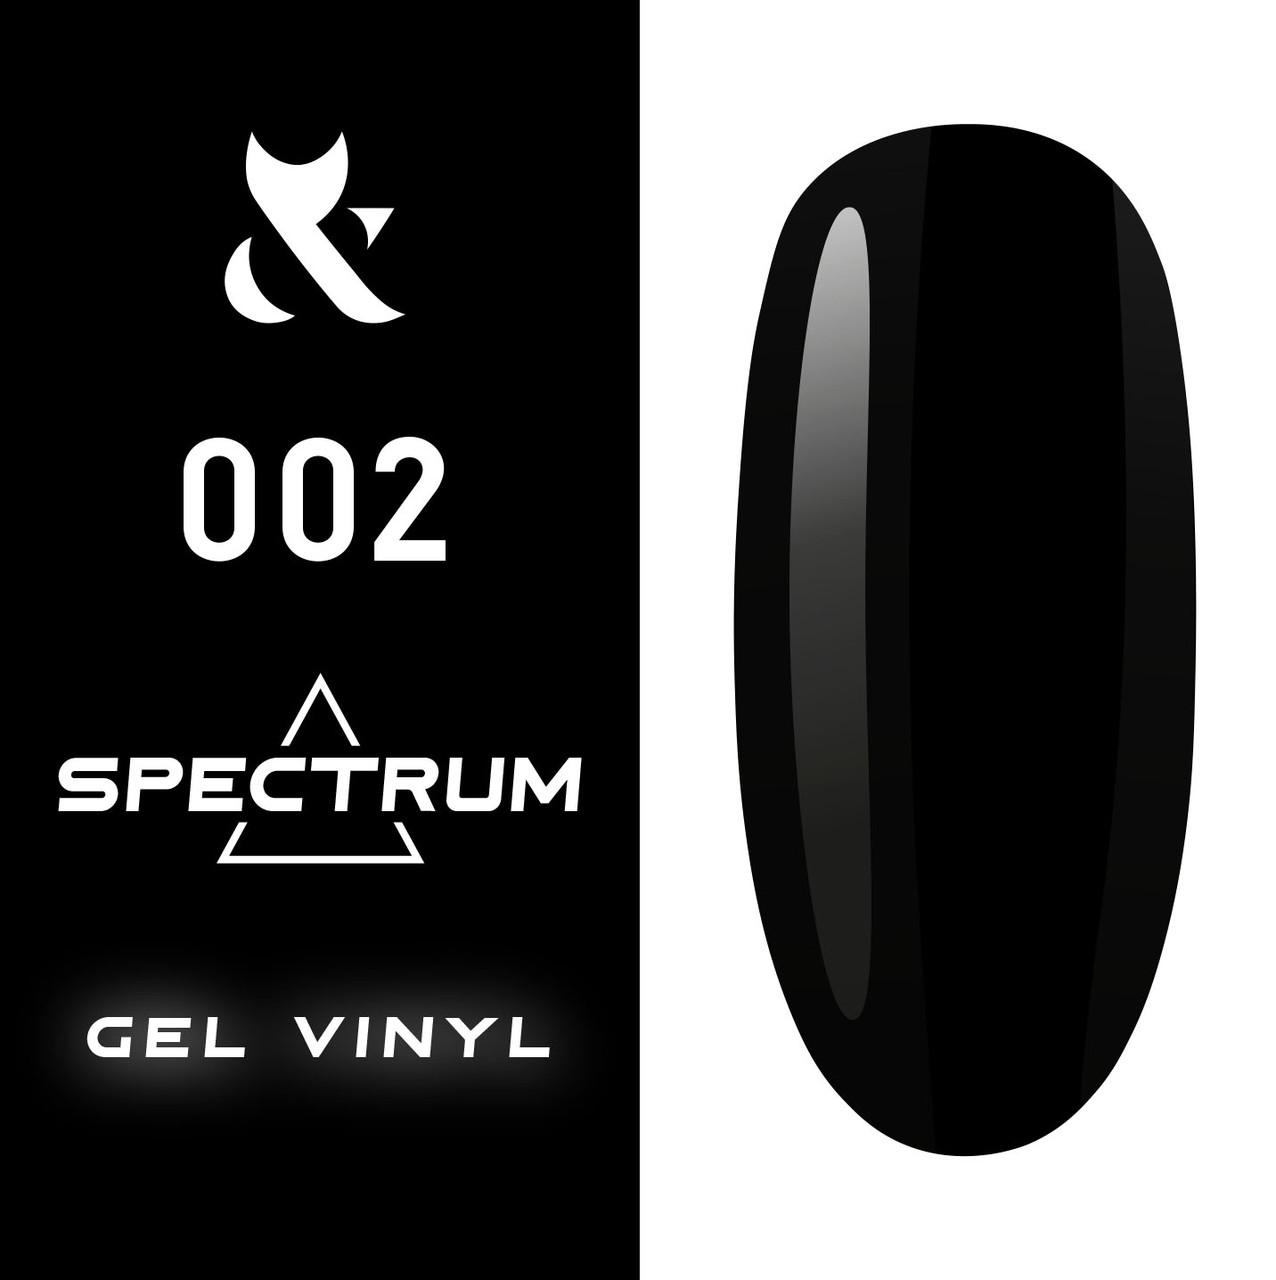 Гель-лак F.O.X Spectrum Gel Vinyl 7 мл № 002, 7мл